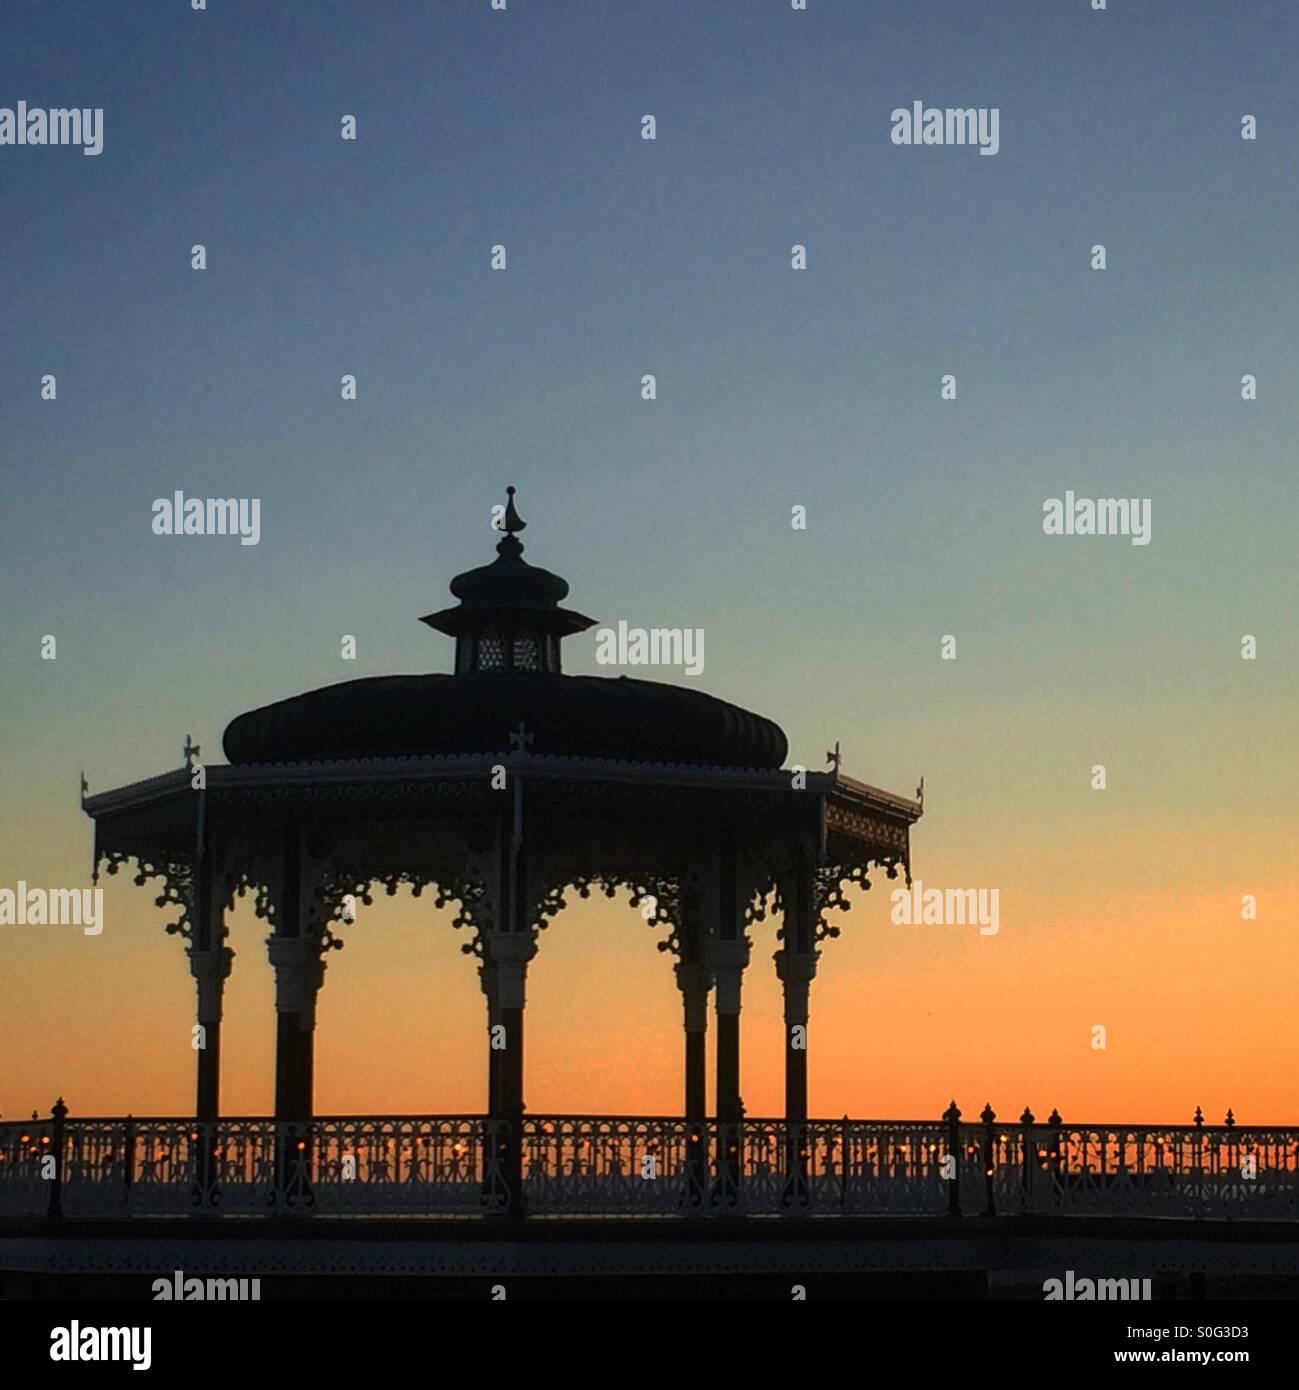 Bandstand at dusk - Stock Image